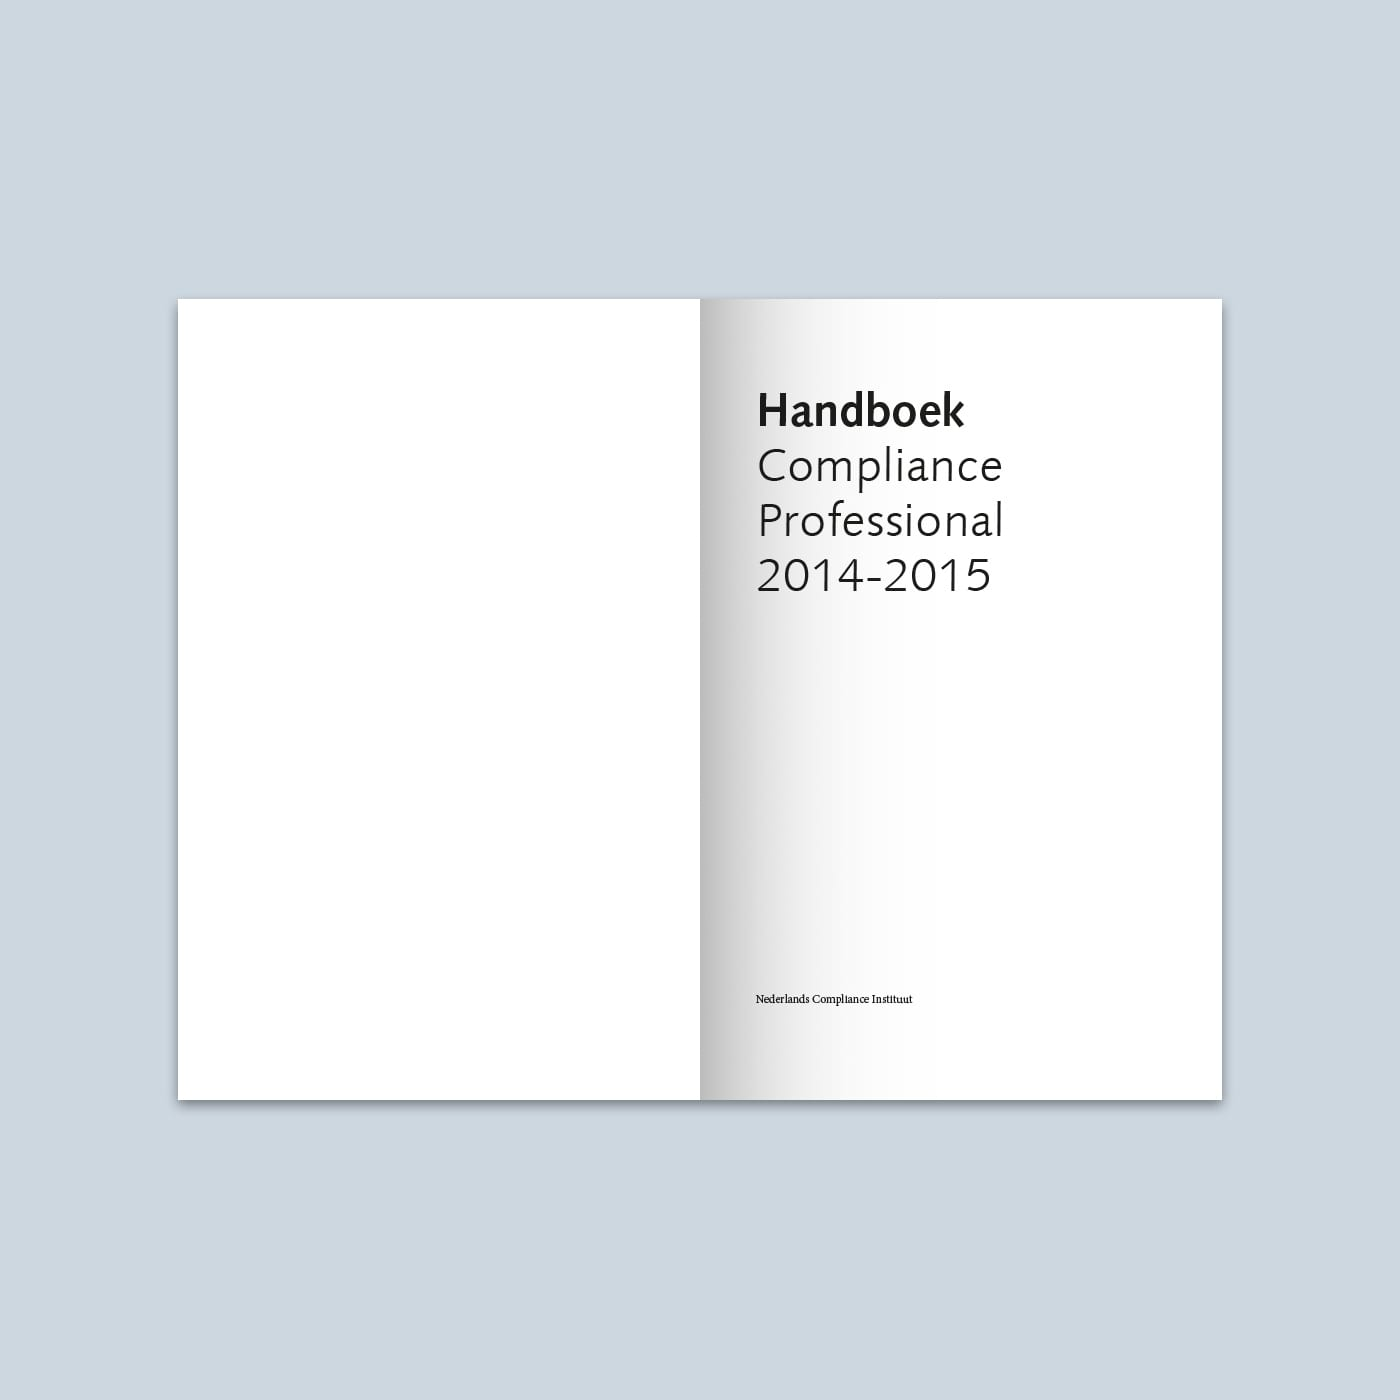 Handboek Compliance Professional 2015 titelpagina